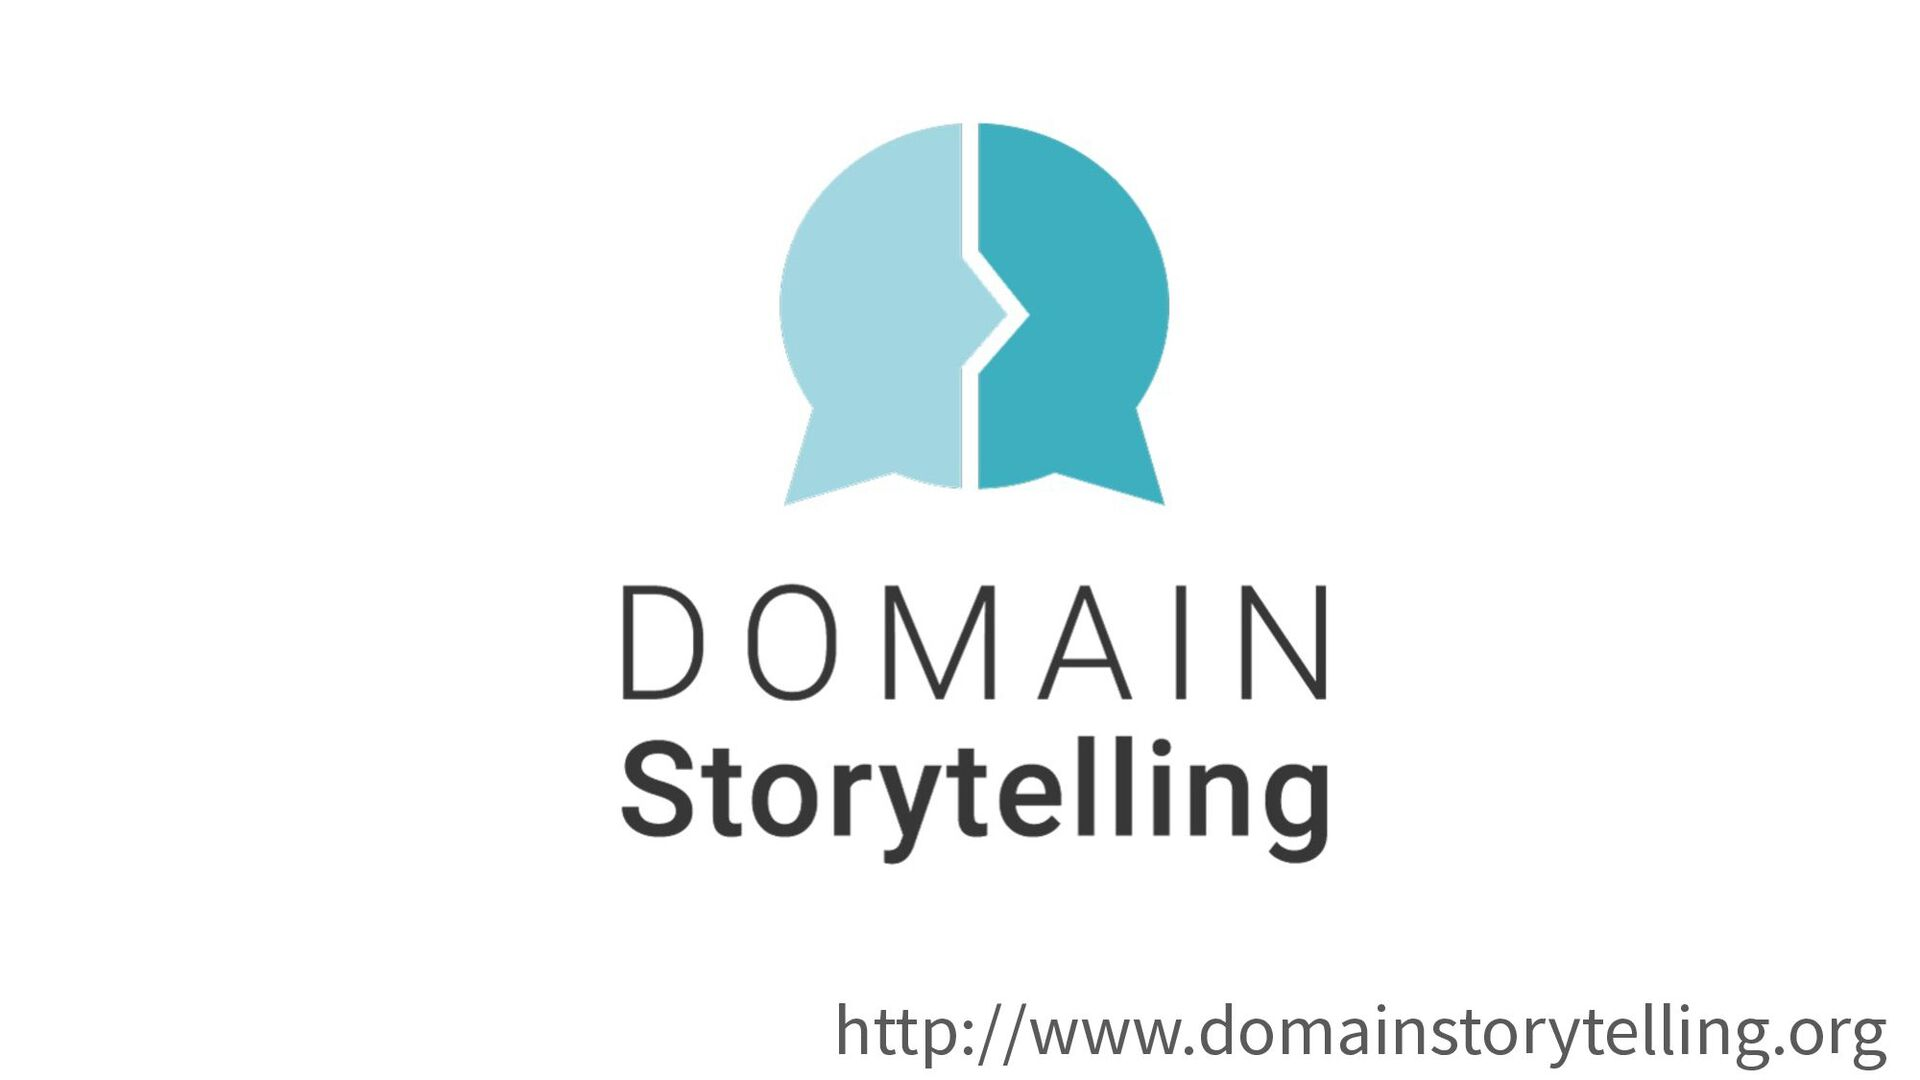 @hschwentner The right people